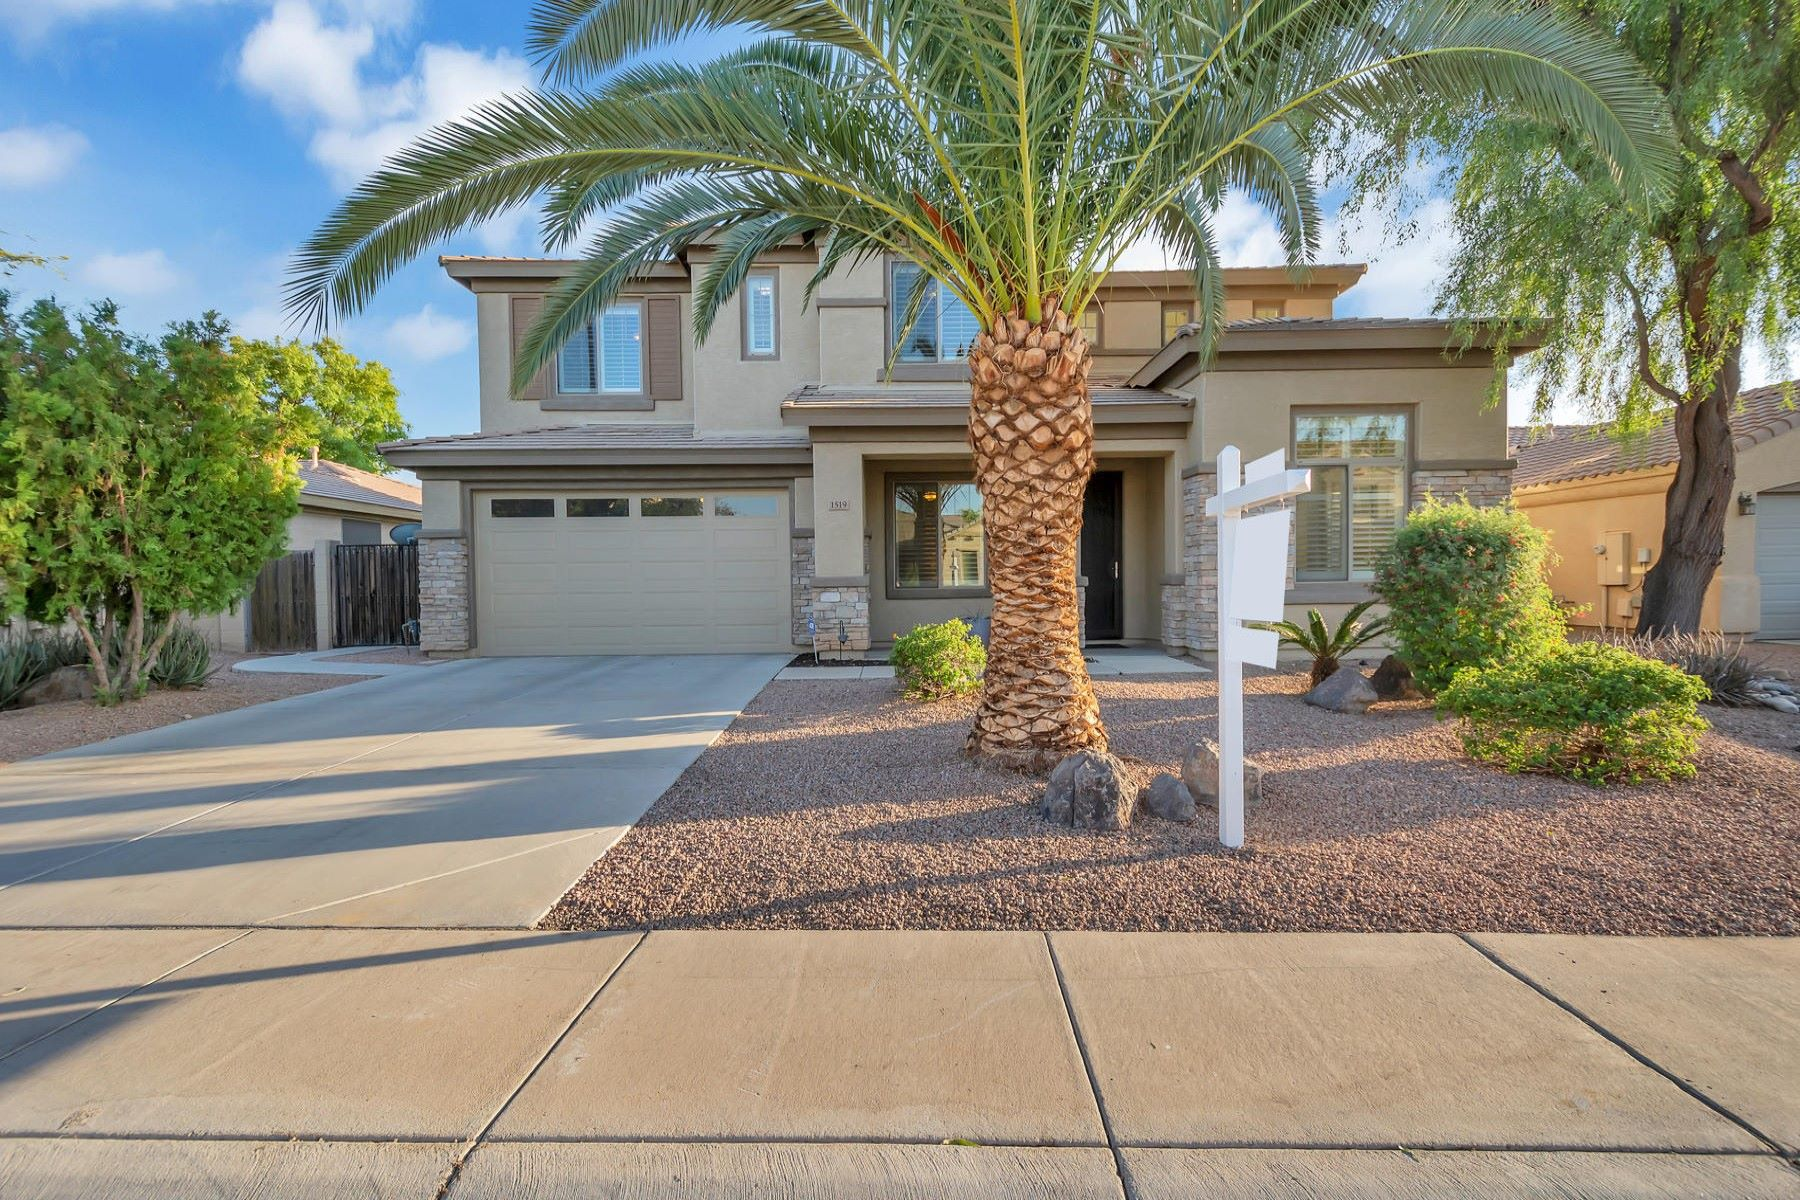 Single Family Homes for Sale at Estates At The Spectrum 1519 East Lark Street Gilbert, Arizona 85297 United States